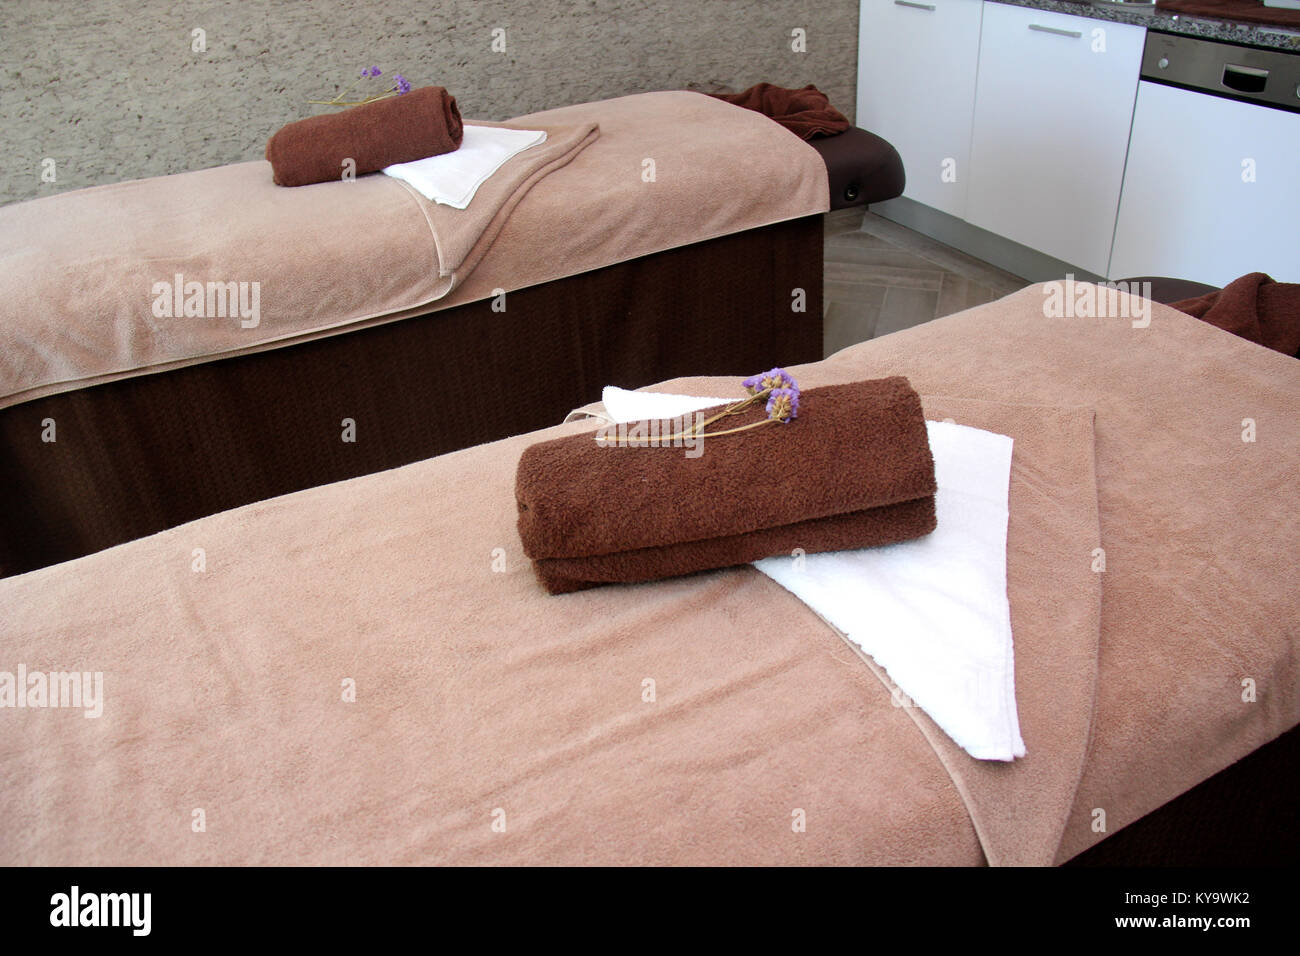 Spa type massage treatment room - Stock Image